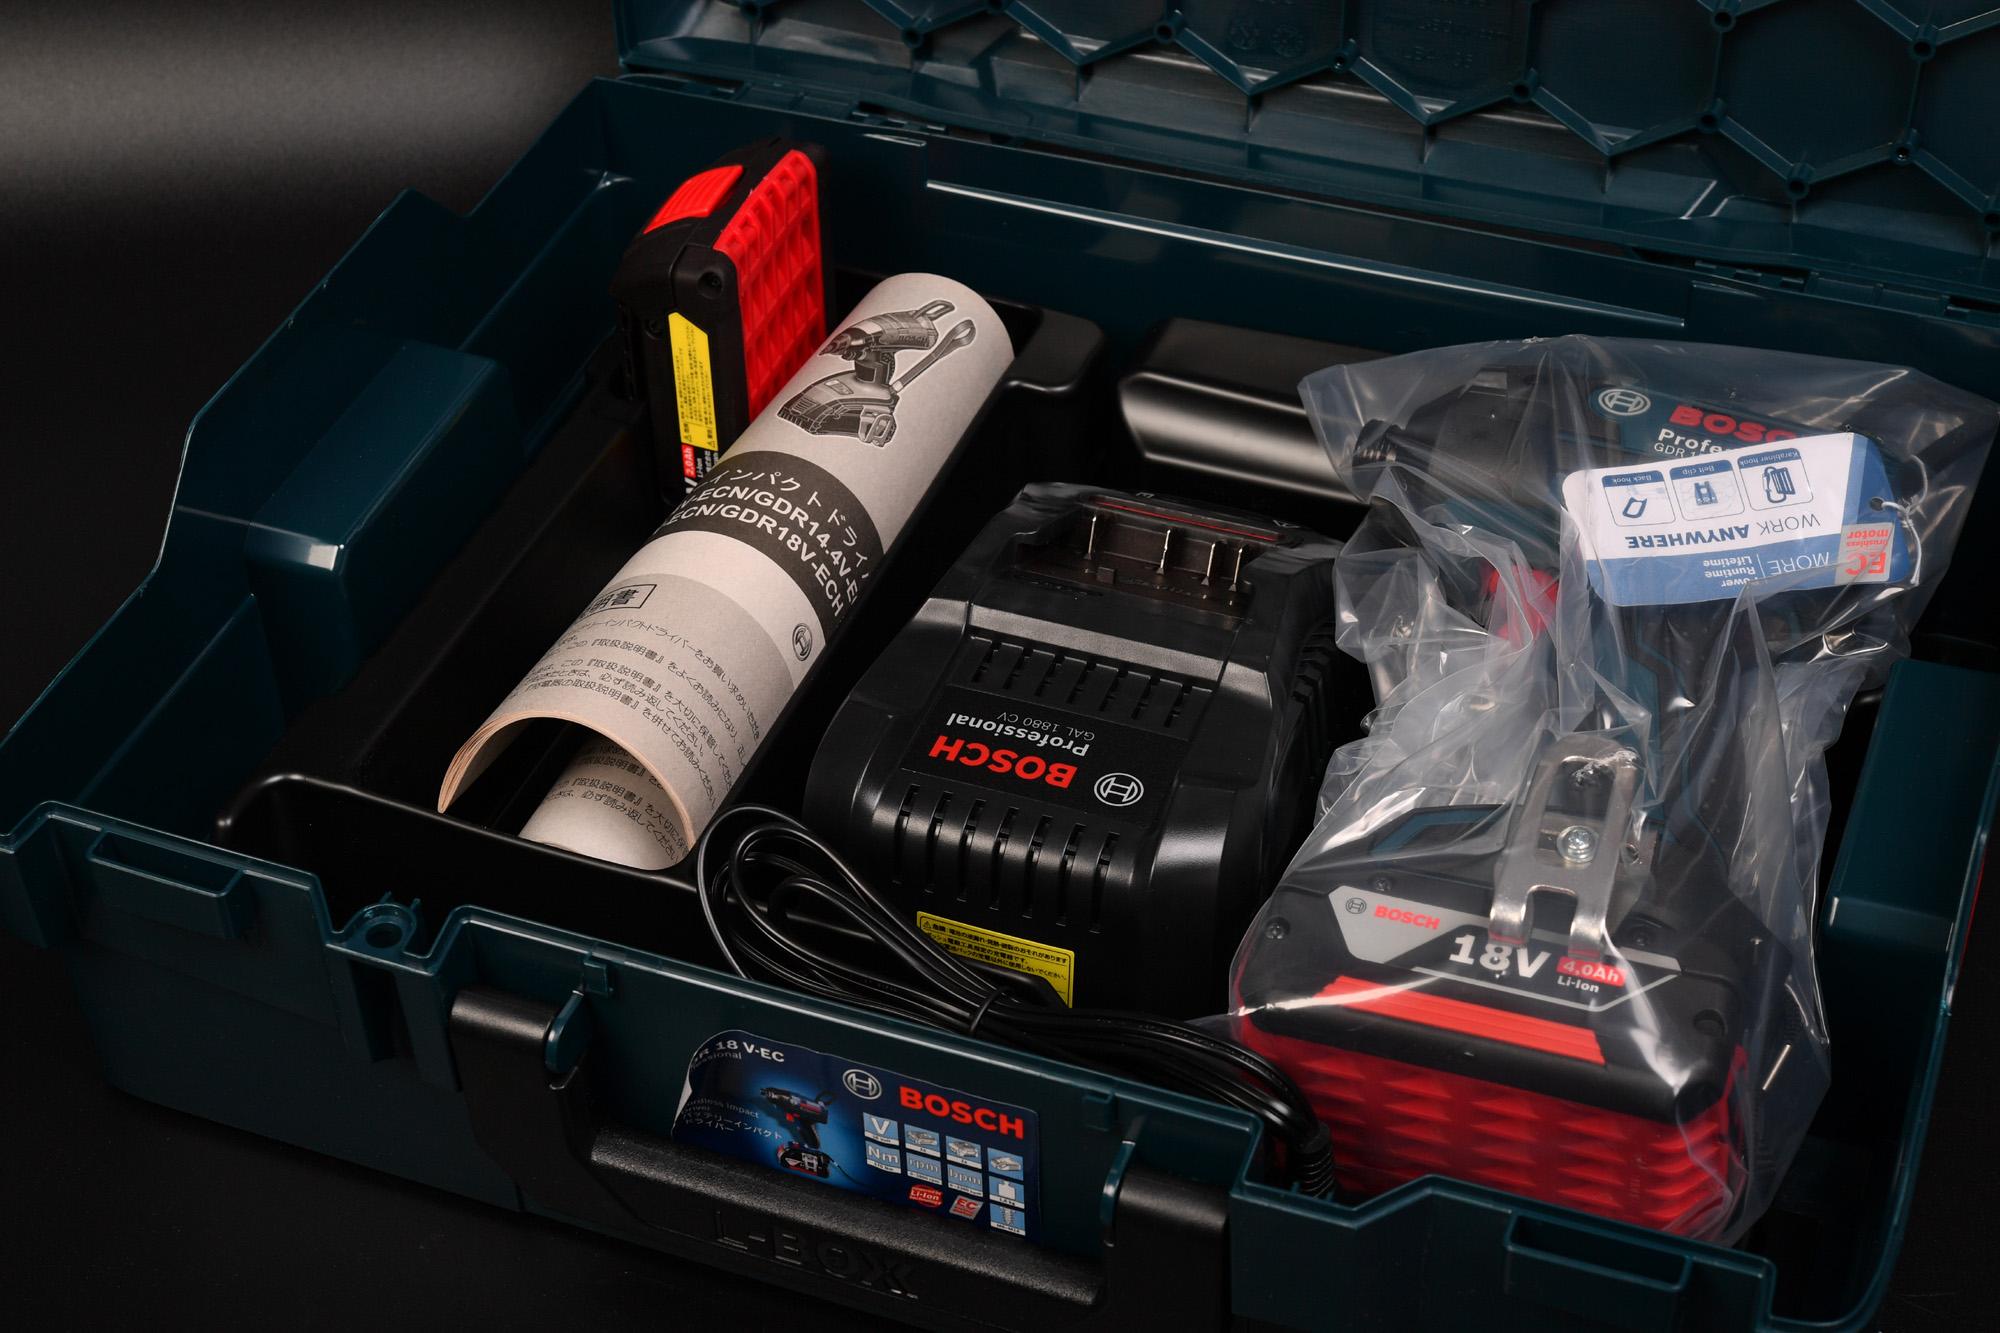 Bosch Professional(ボッシュ)18V コードレスインパクトドライバー 購入